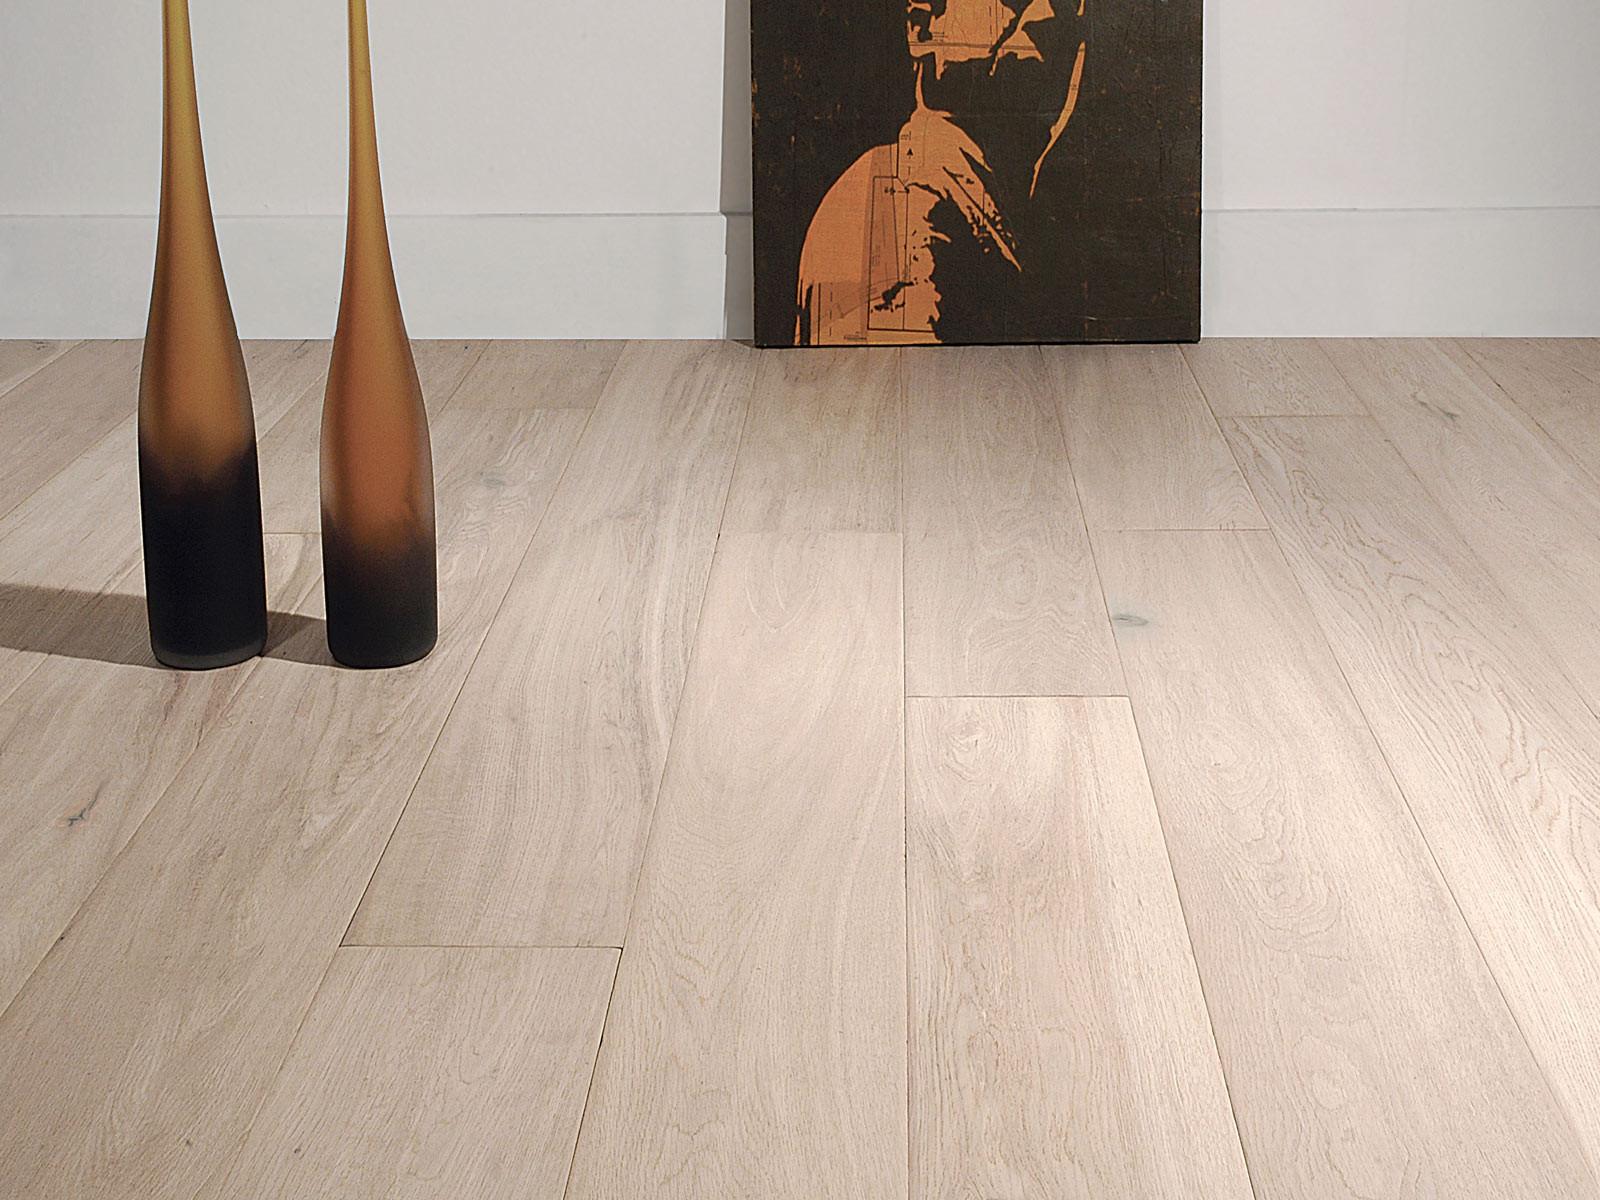 hardwood flooring sale houston of provenza hardwood flooring houston tx discount premium wood floors pertaining to hardwood floors a· white oiled